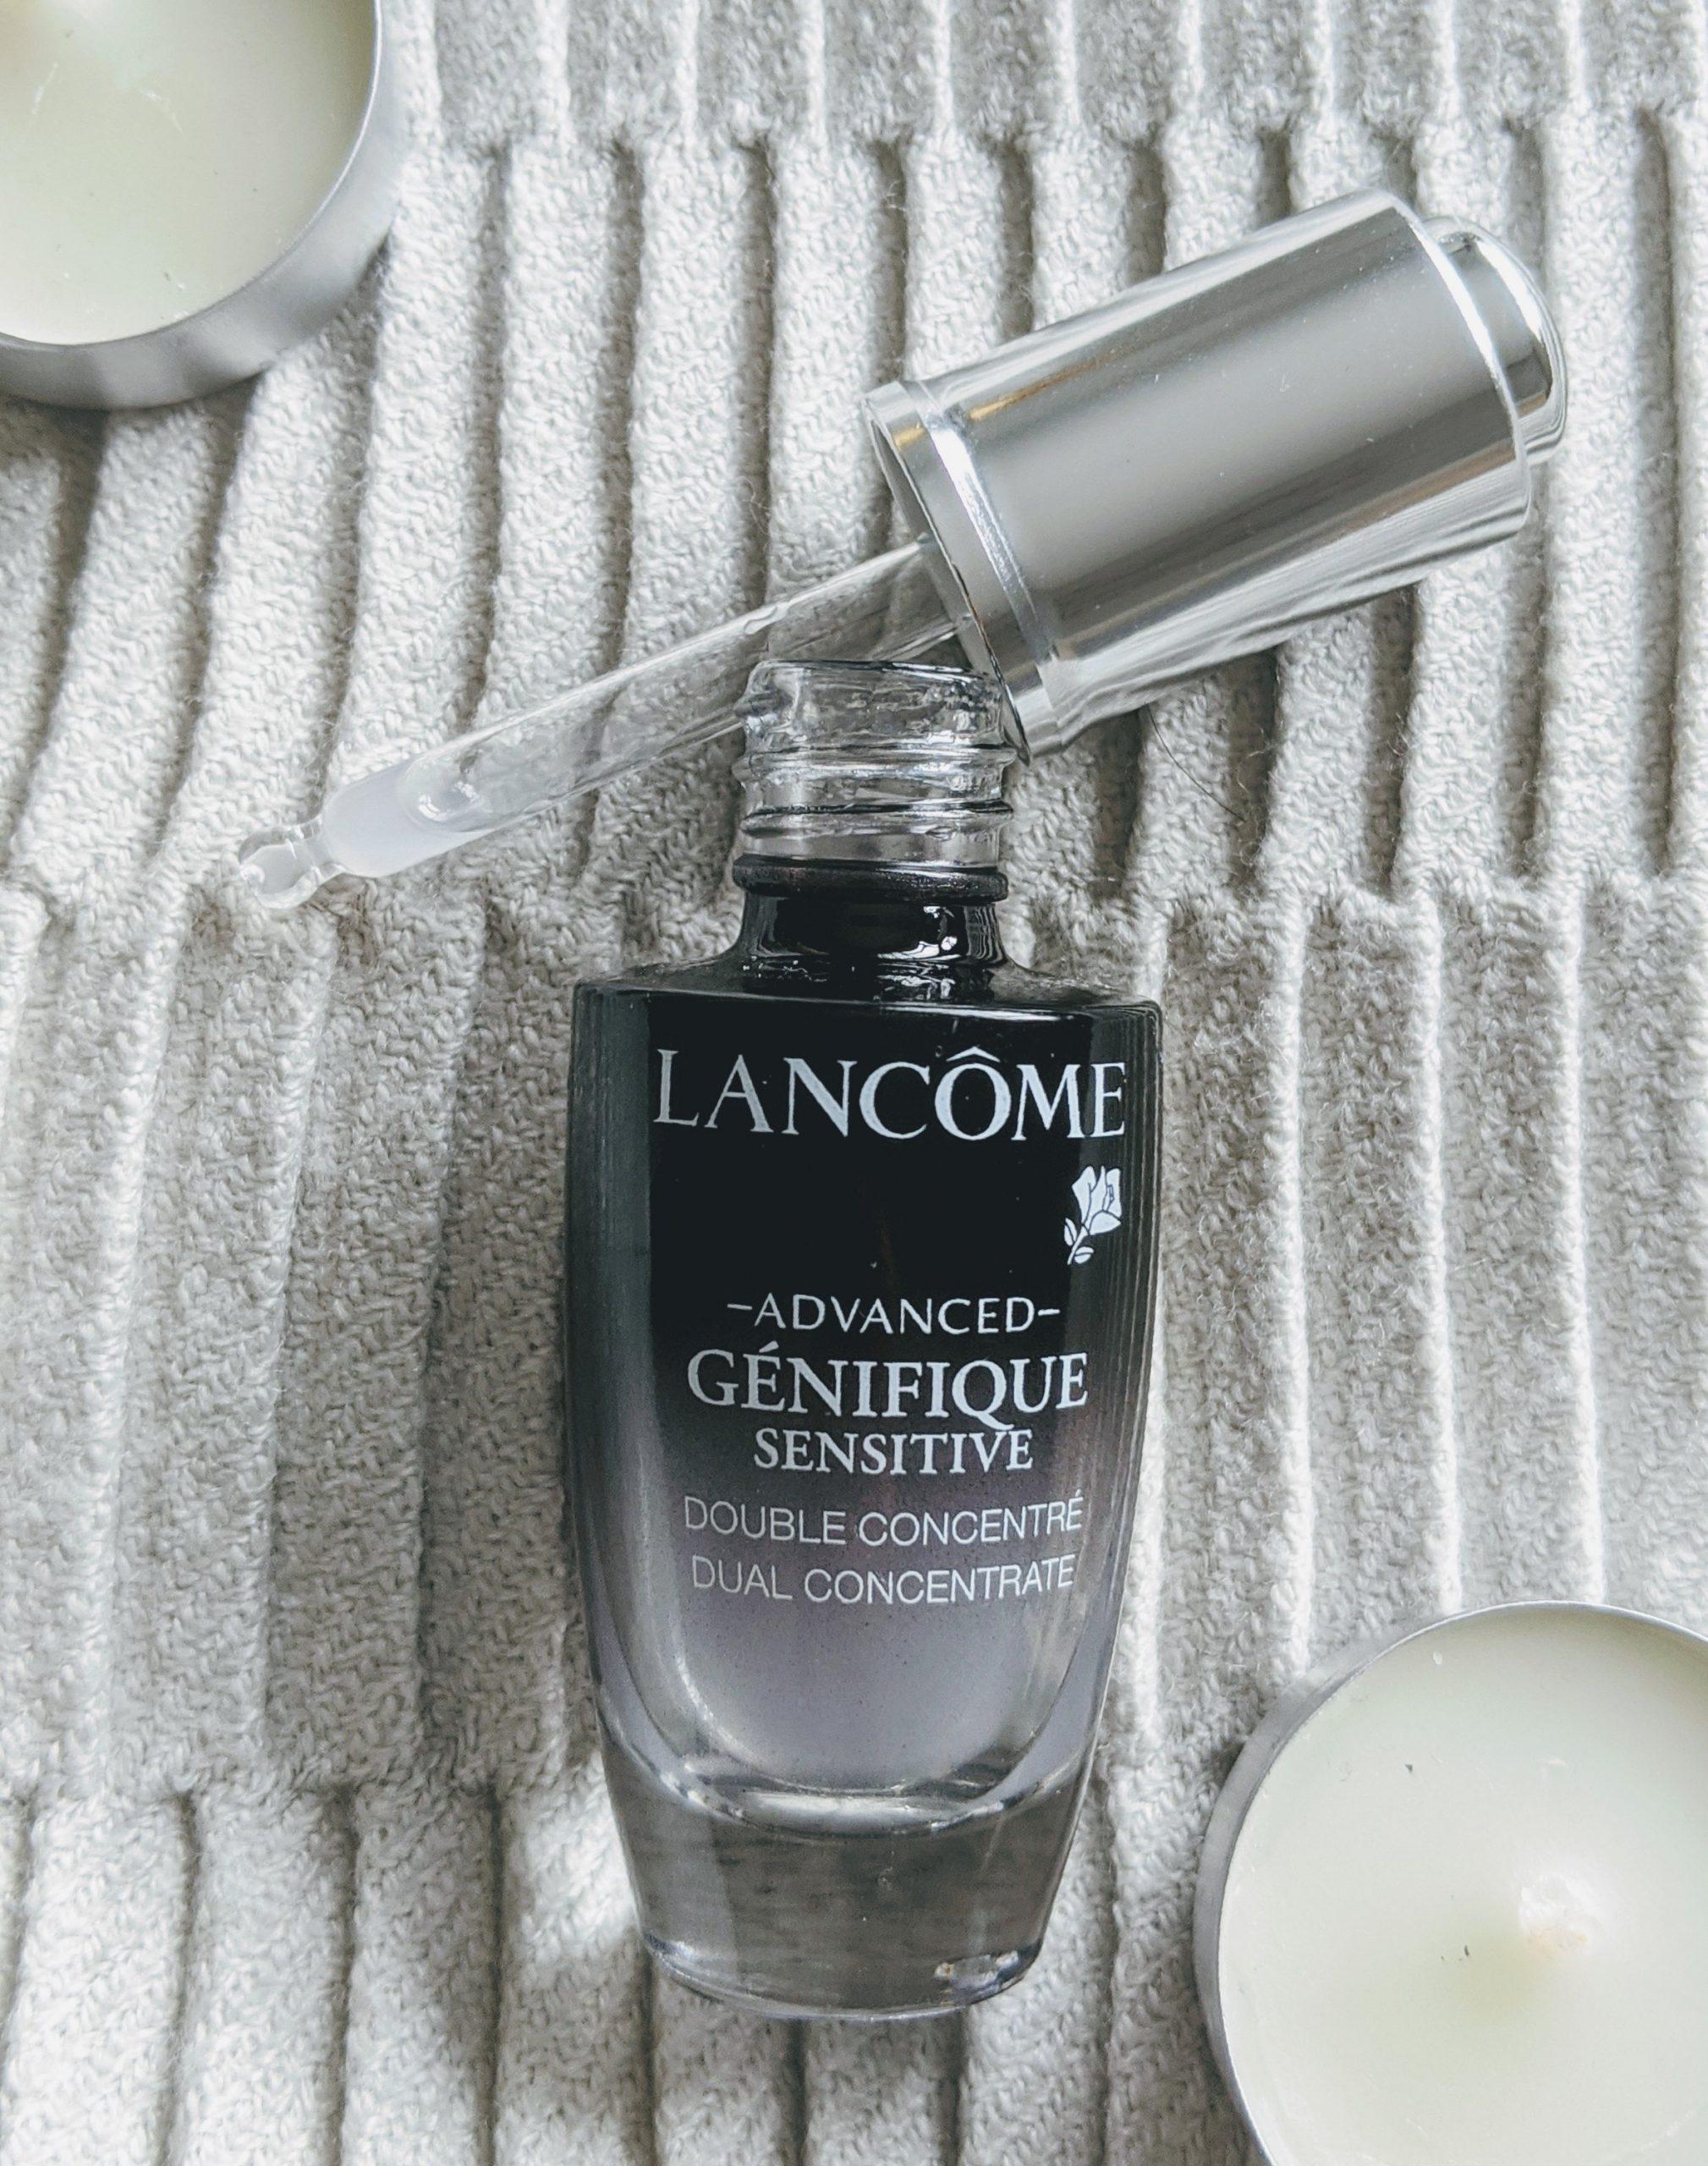 Product Pick of the Month: Lancome Advanced Genifique (Sensitive)